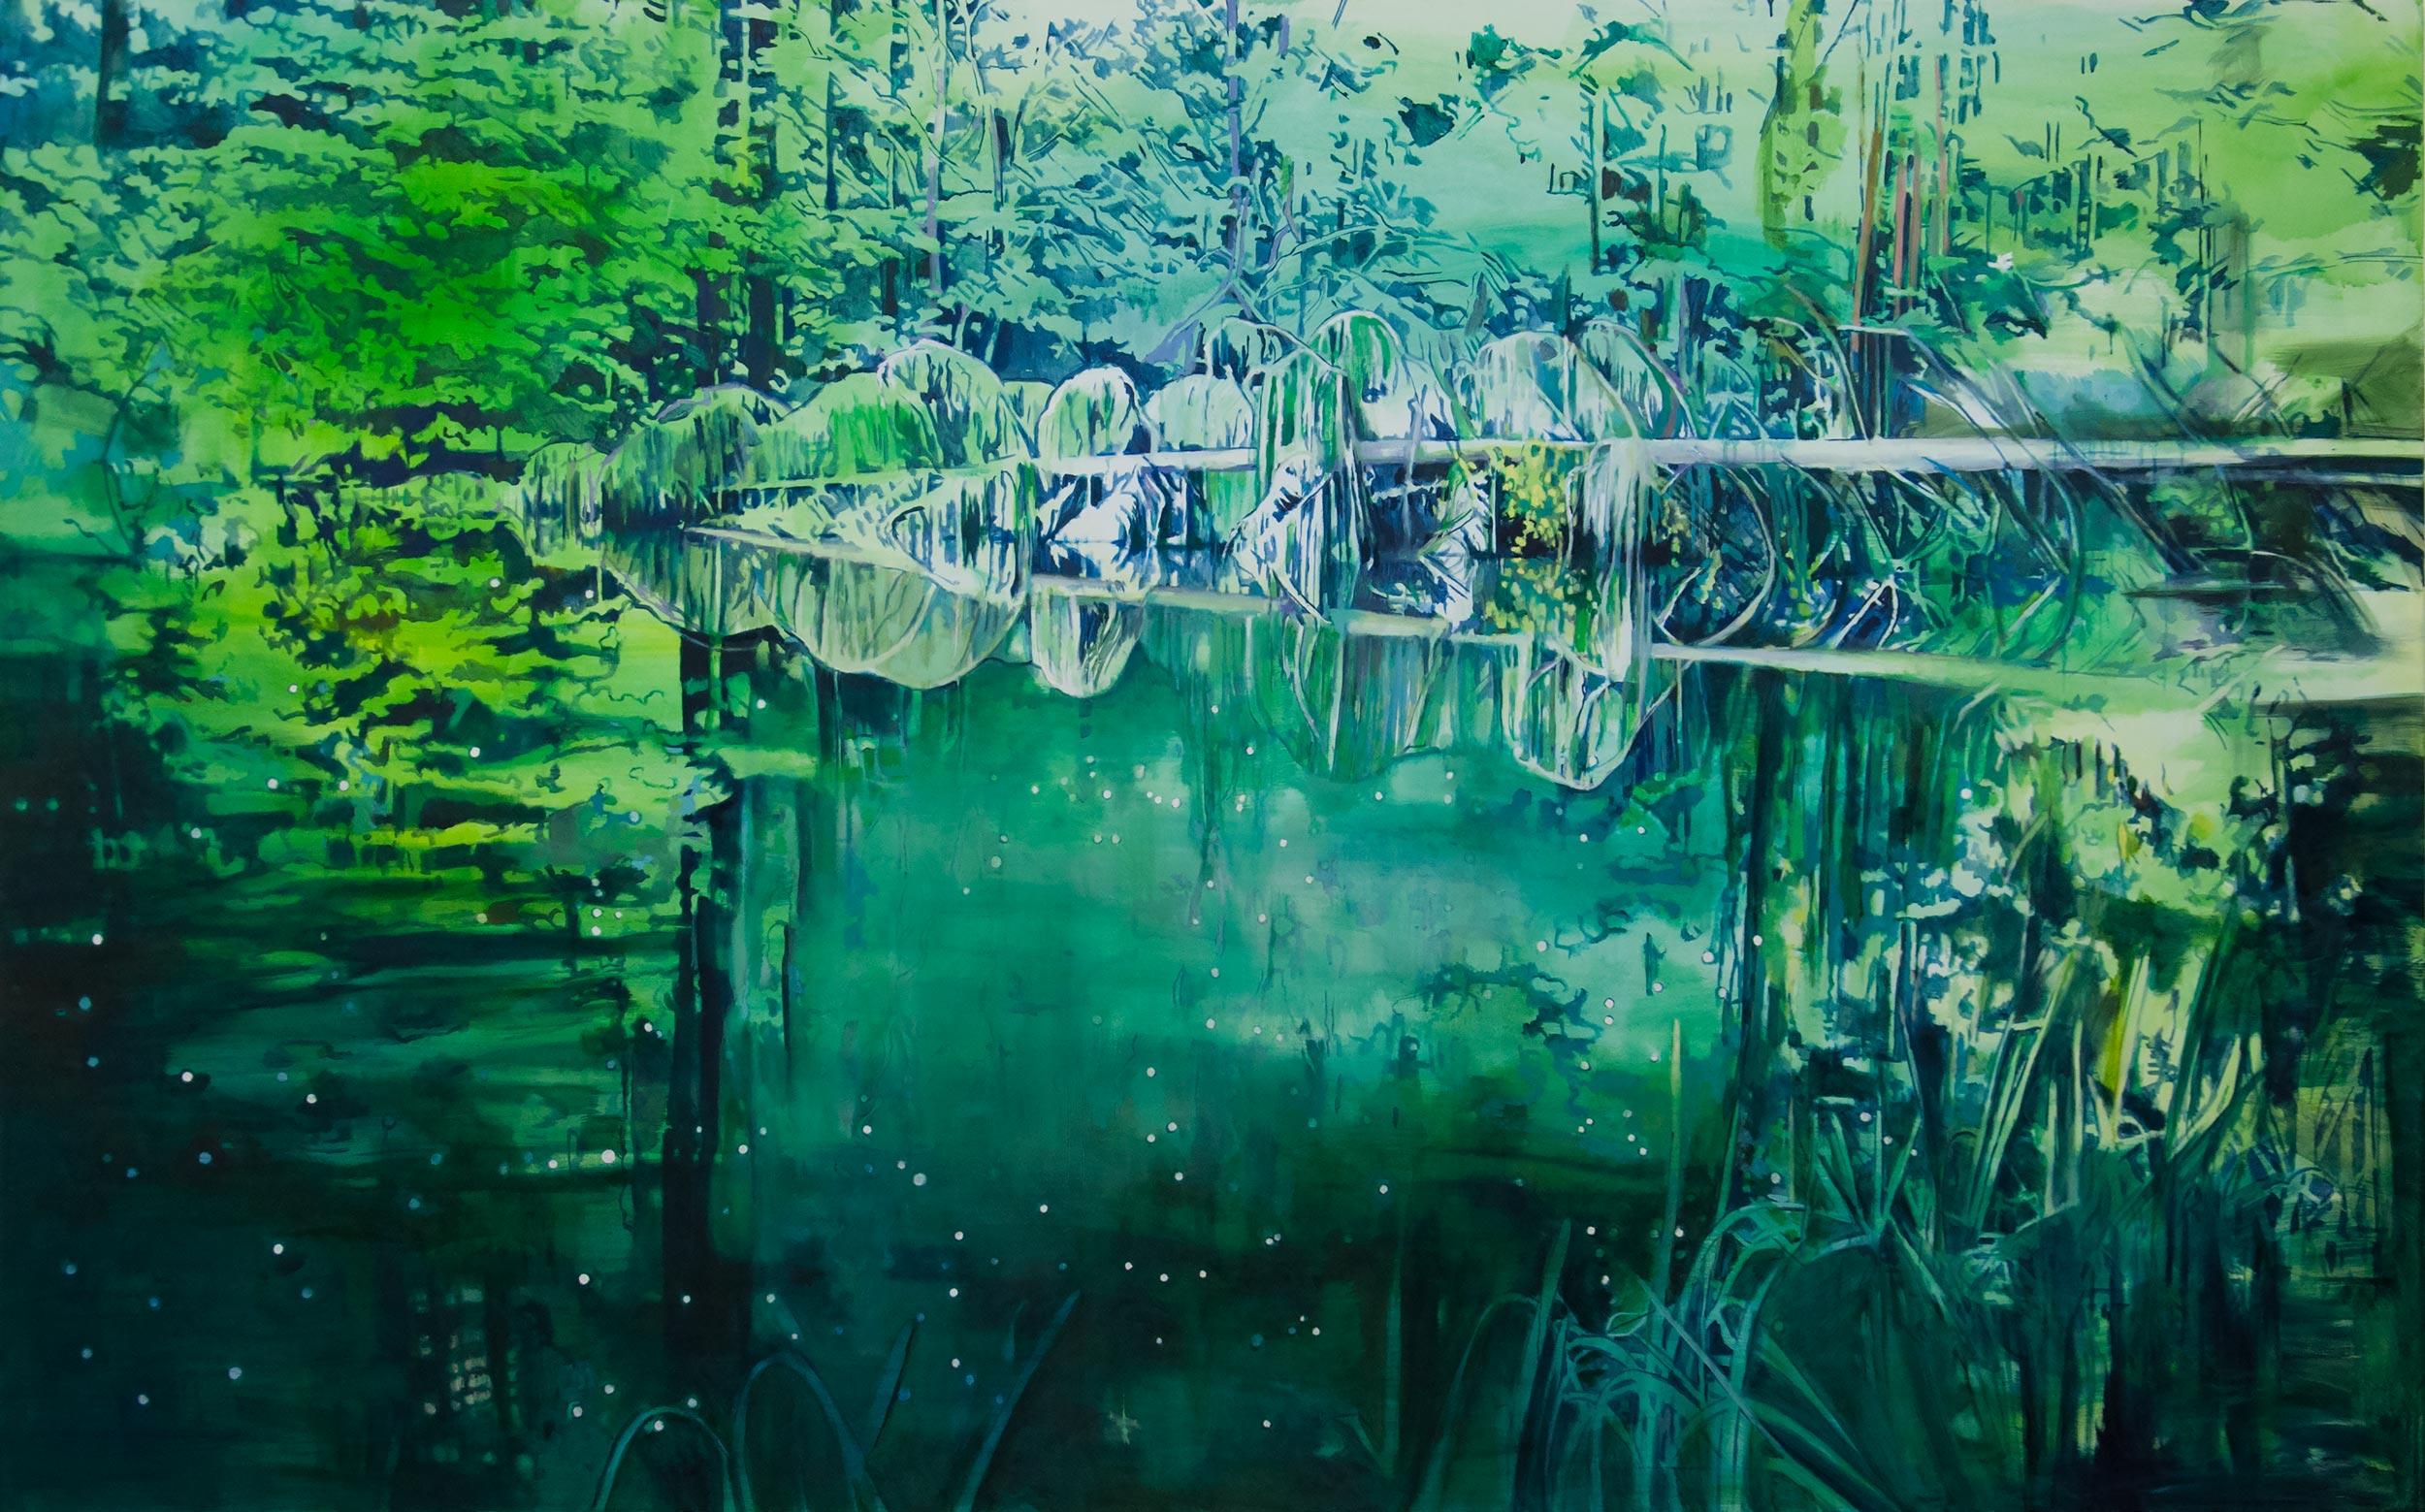 Gisela Krohn - Passion 1, 190 x 300 cm, 2015